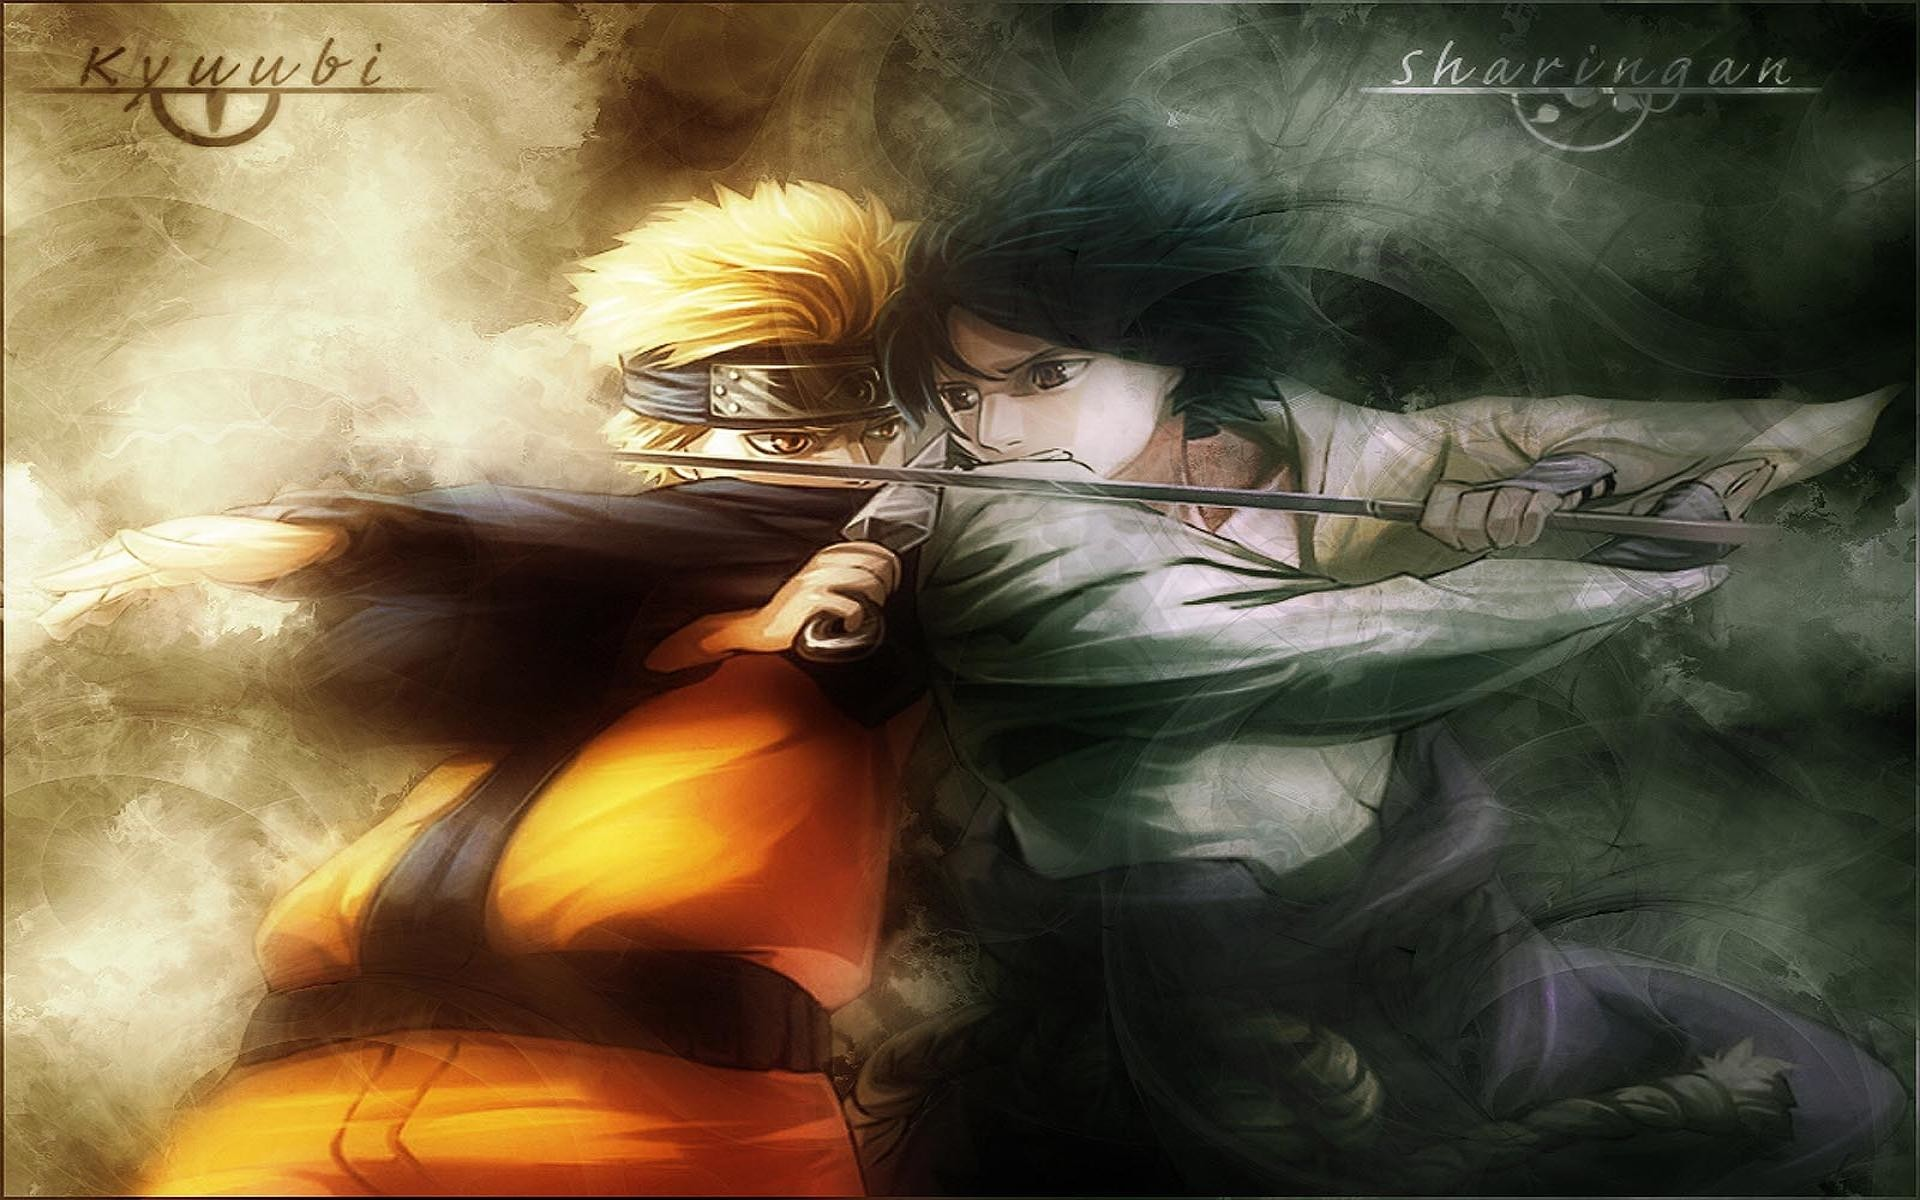 Naruto Vs Sasuke Fight Hd Wallpaper | Wallpaper List